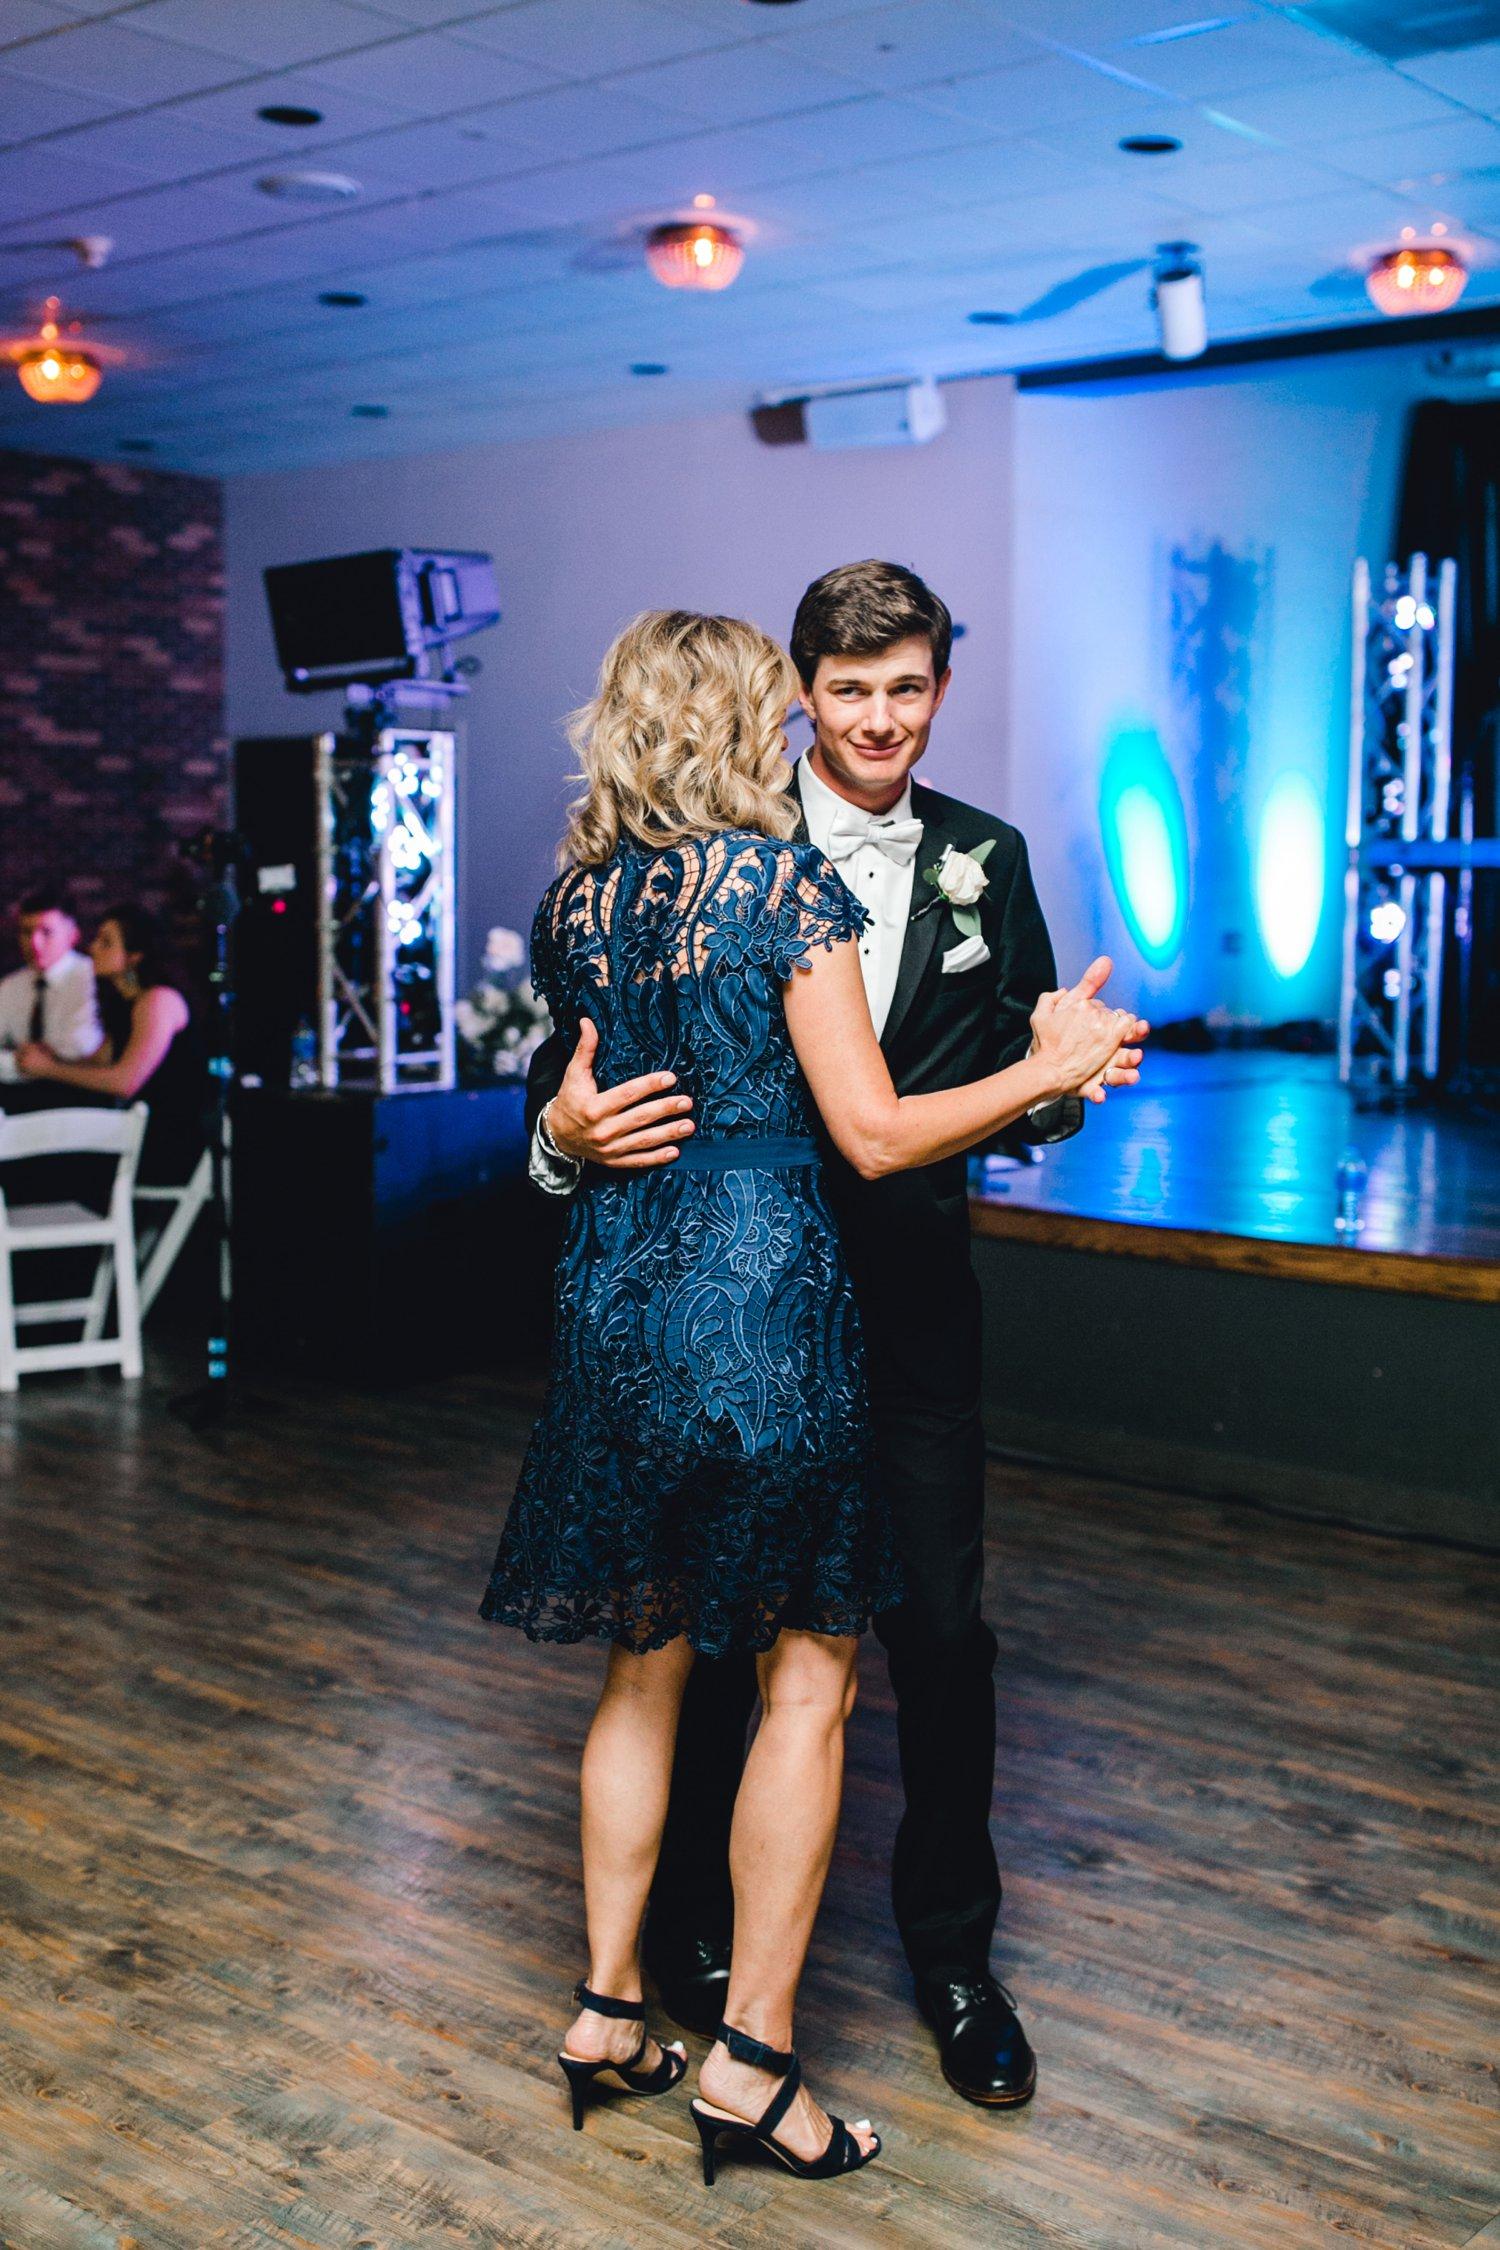 Hunter_and_Molly_Rawls_ALLEEJ_Lubbock_WEDDING_Legacy_Event_Center_0174.jpg